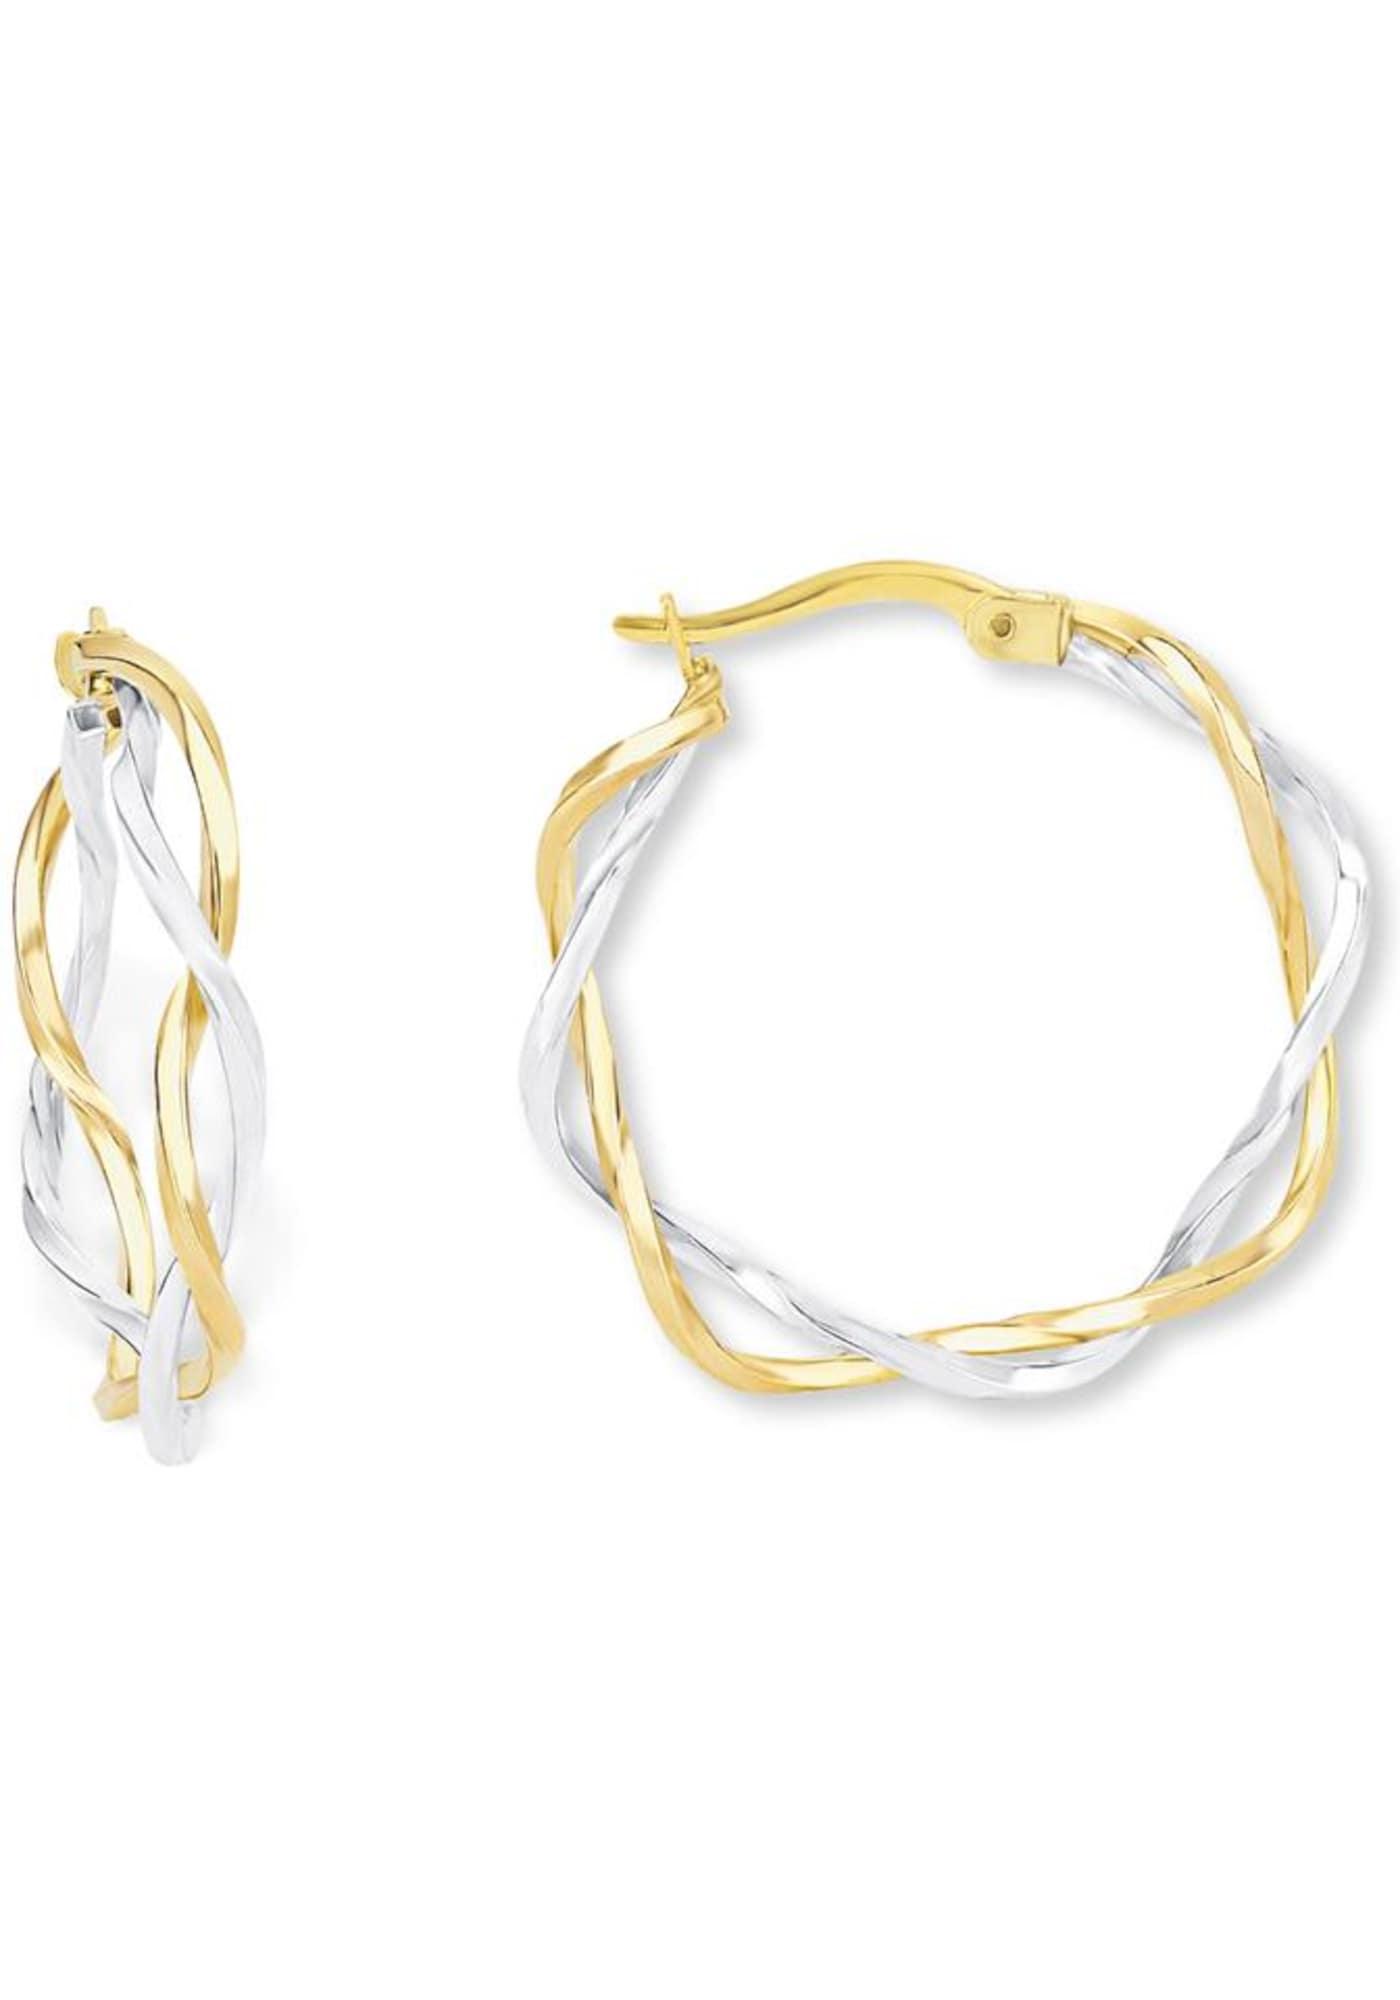 Ohrringe für Frauen - AMOR Creolen gold silber  - Onlineshop ABOUT YOU